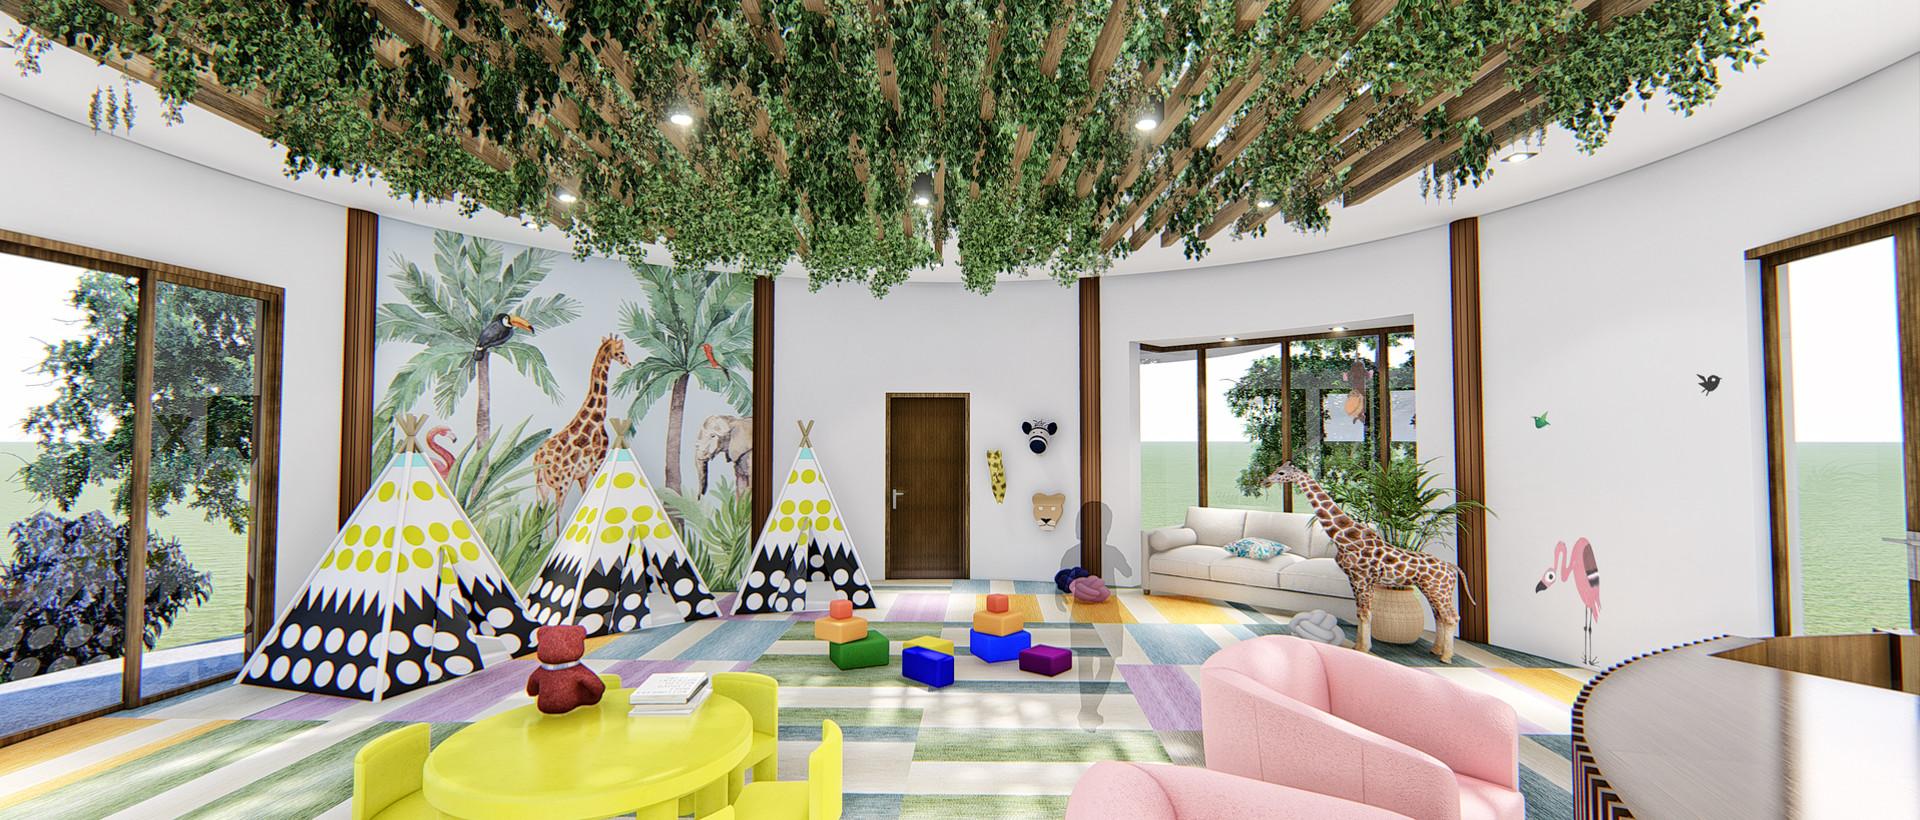 Outrigger Phuket - Topo Design Studio (5